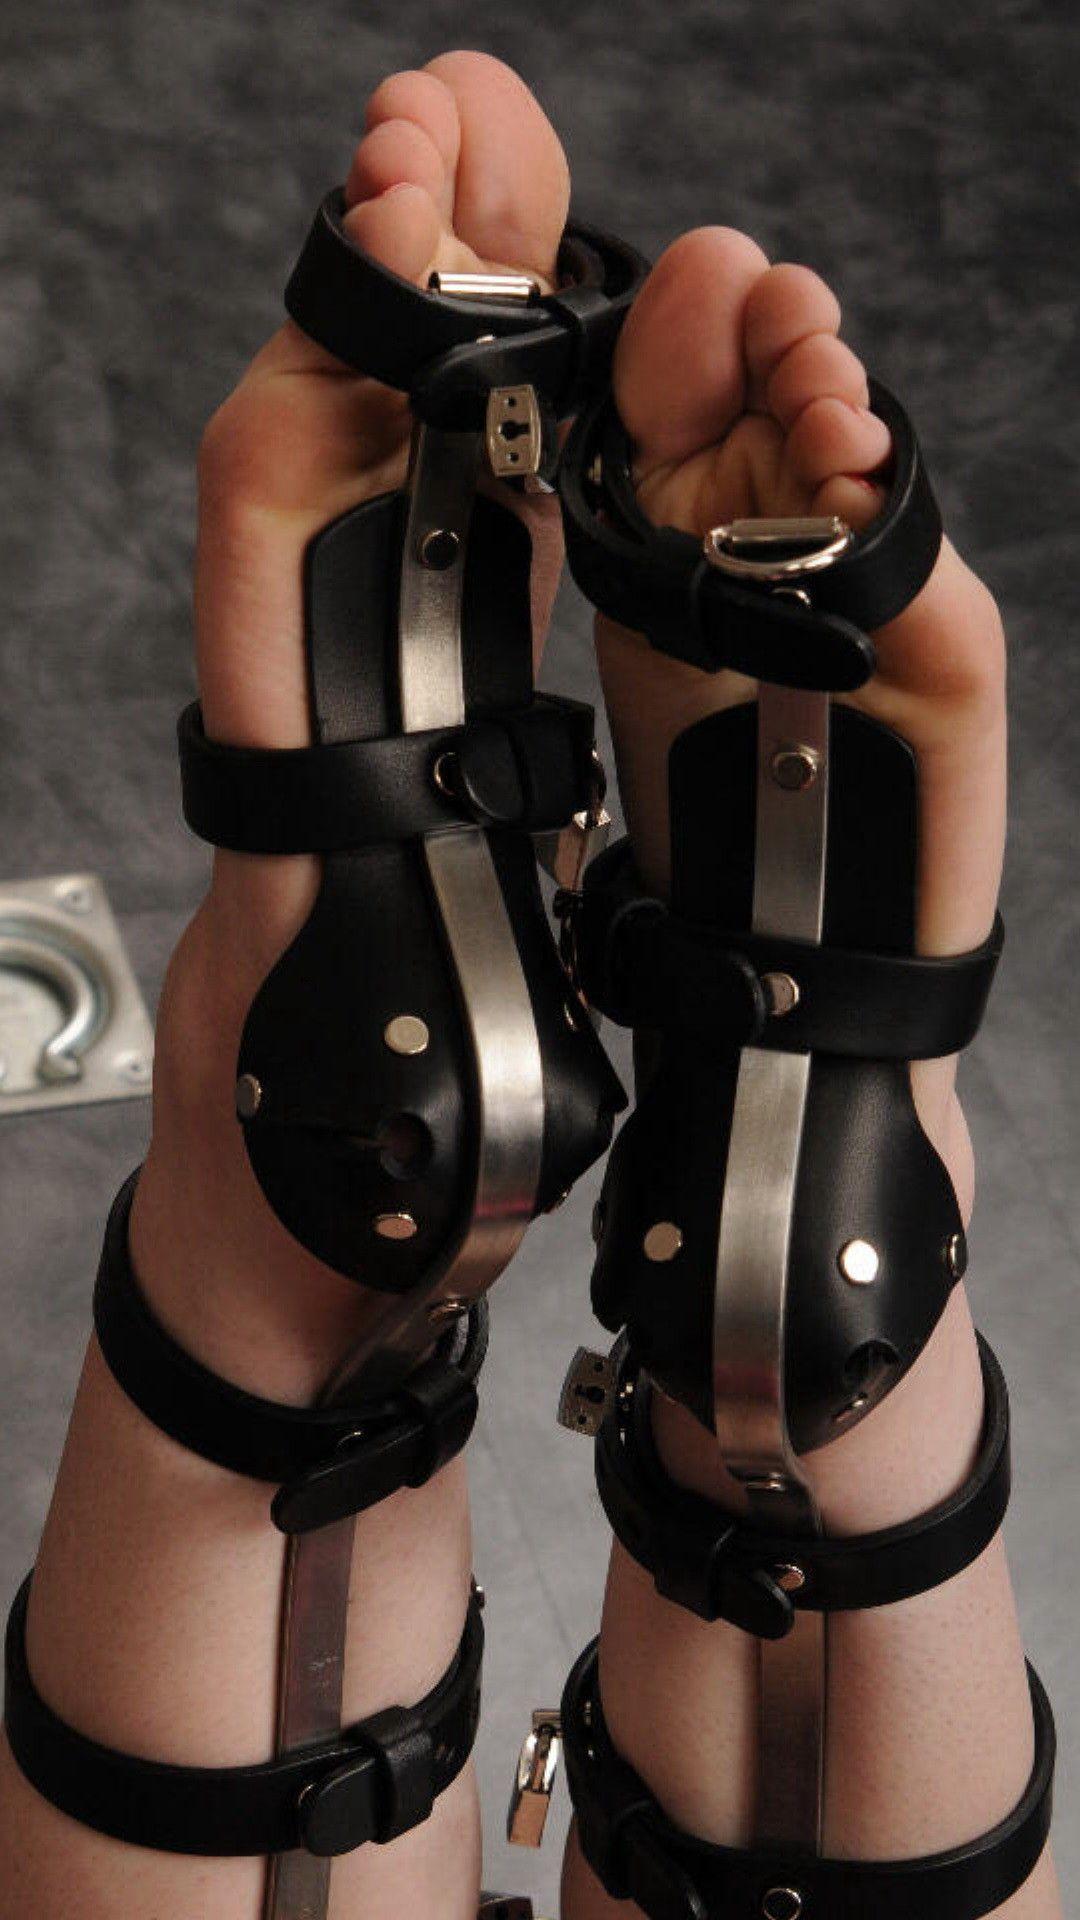 inflatable anal plug bondage